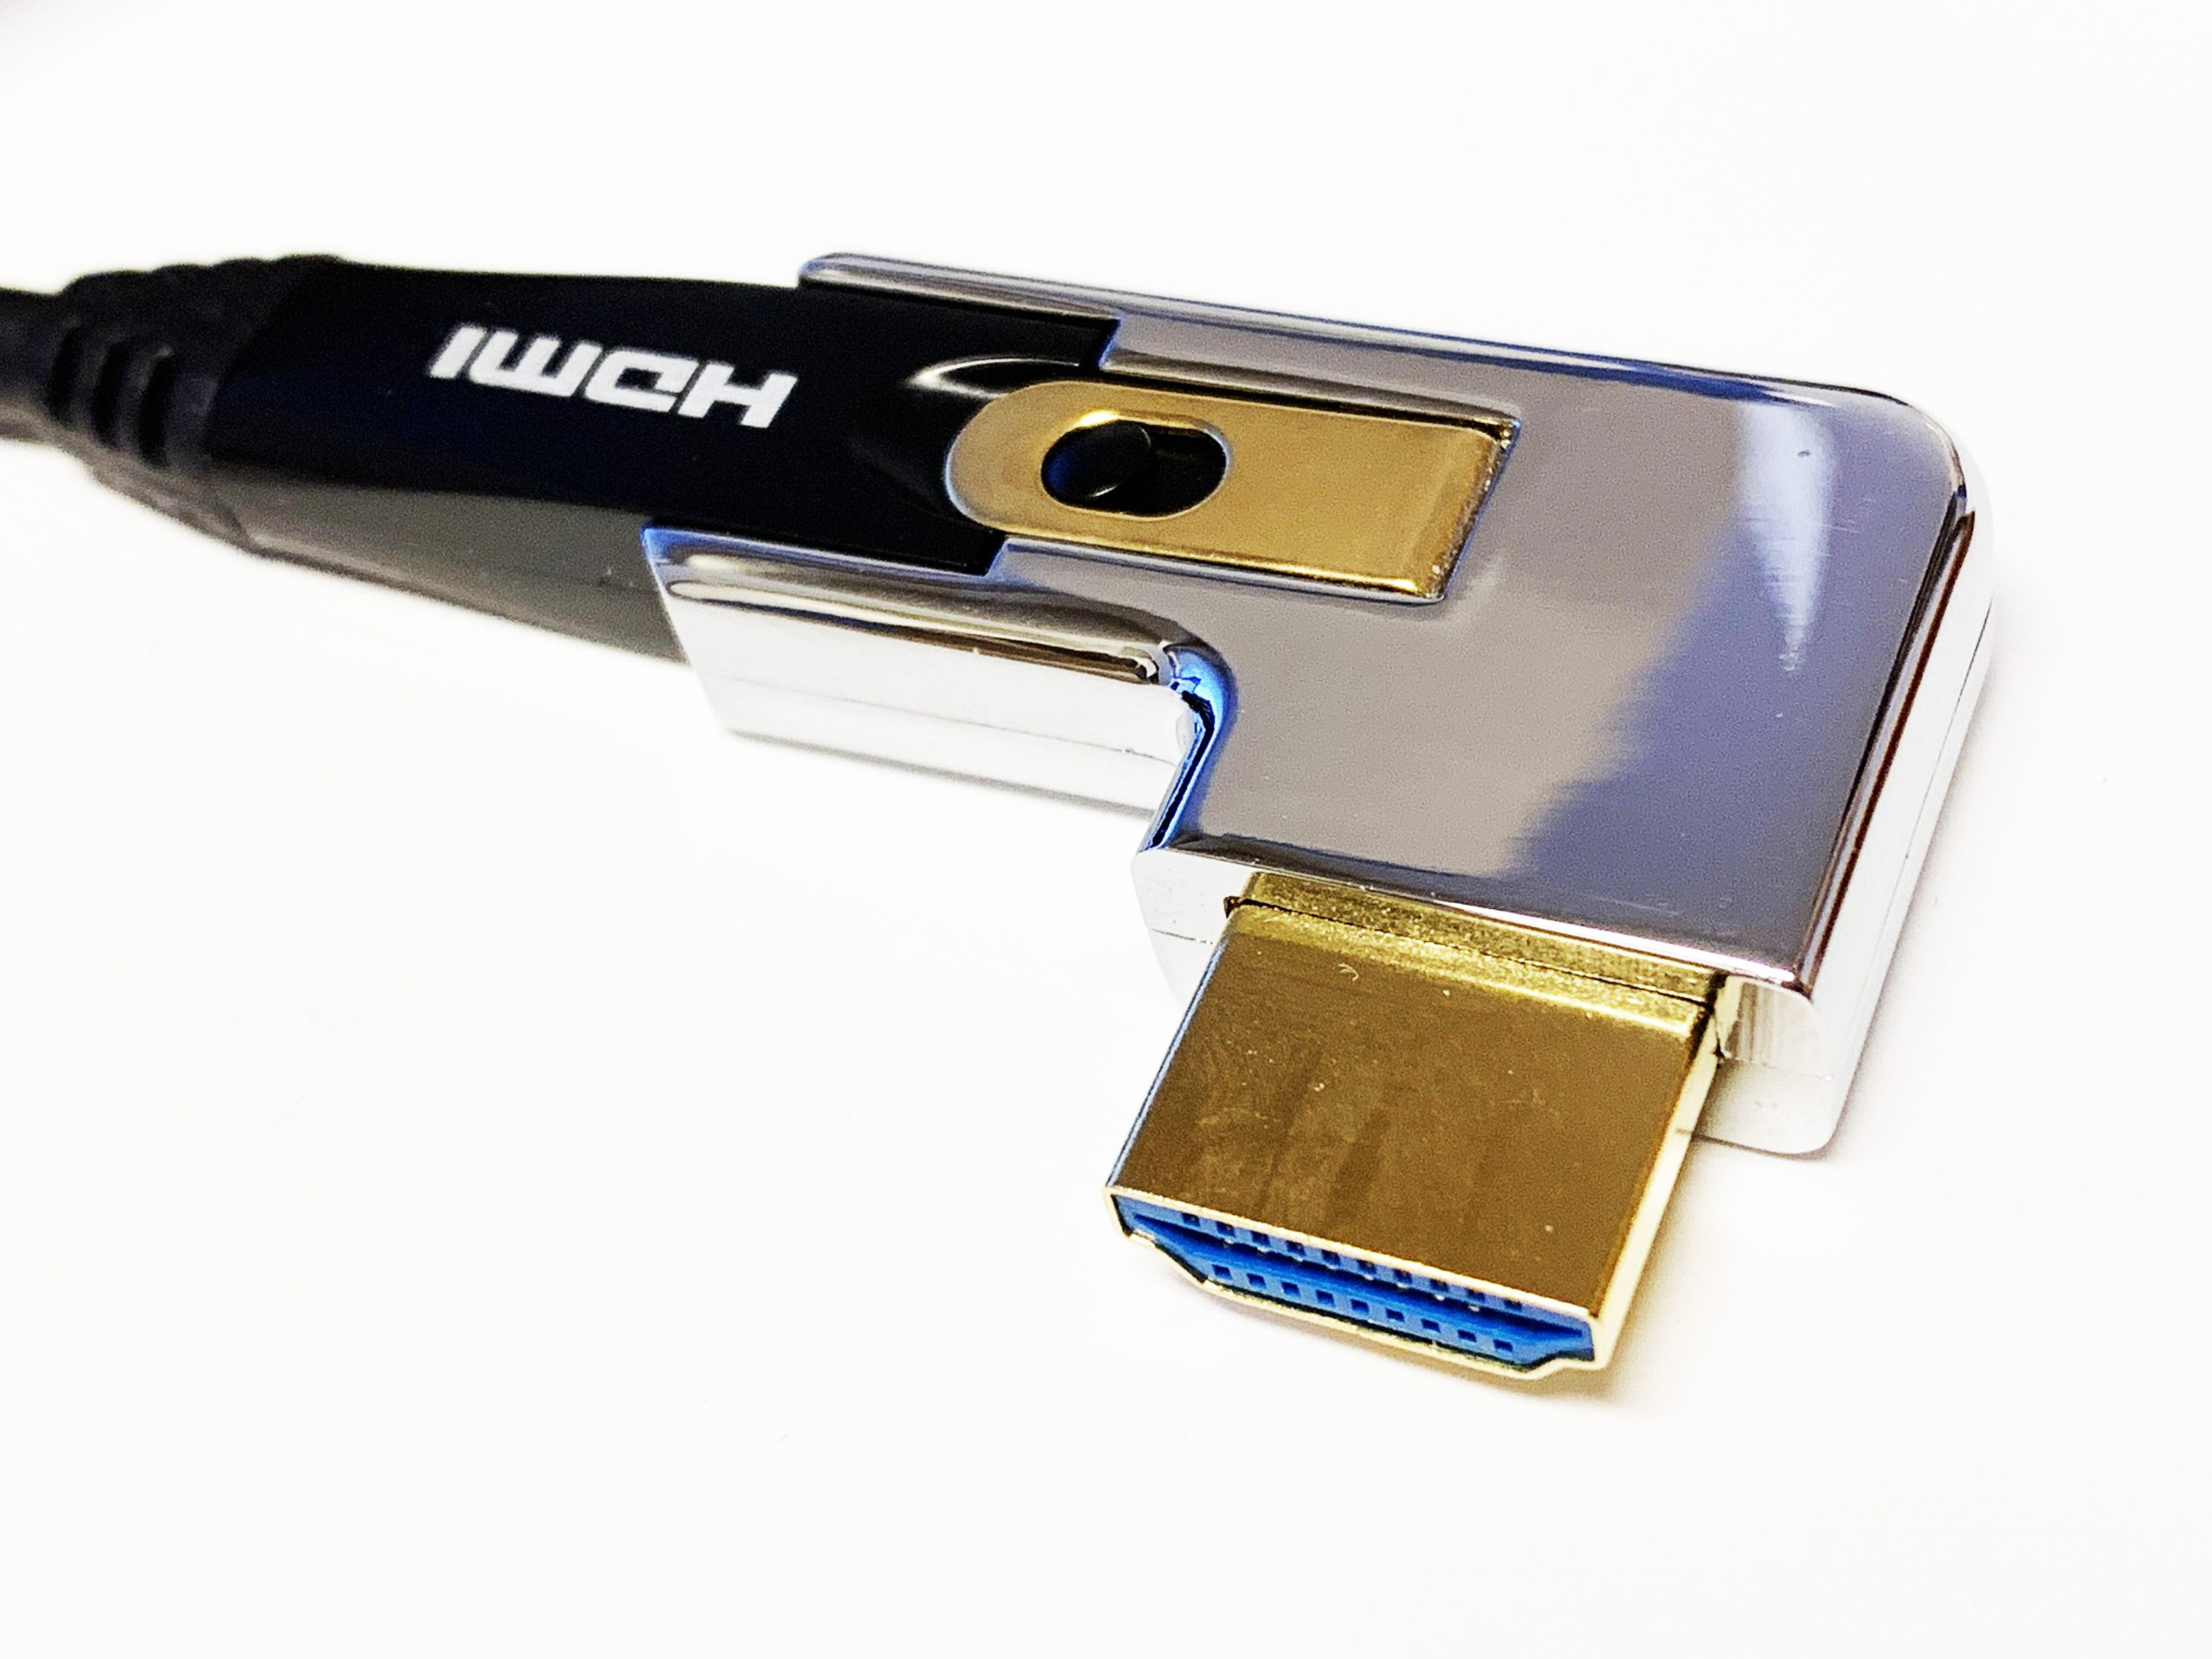 DreamScreen UltraFiber Stealth Y-LINK adapter